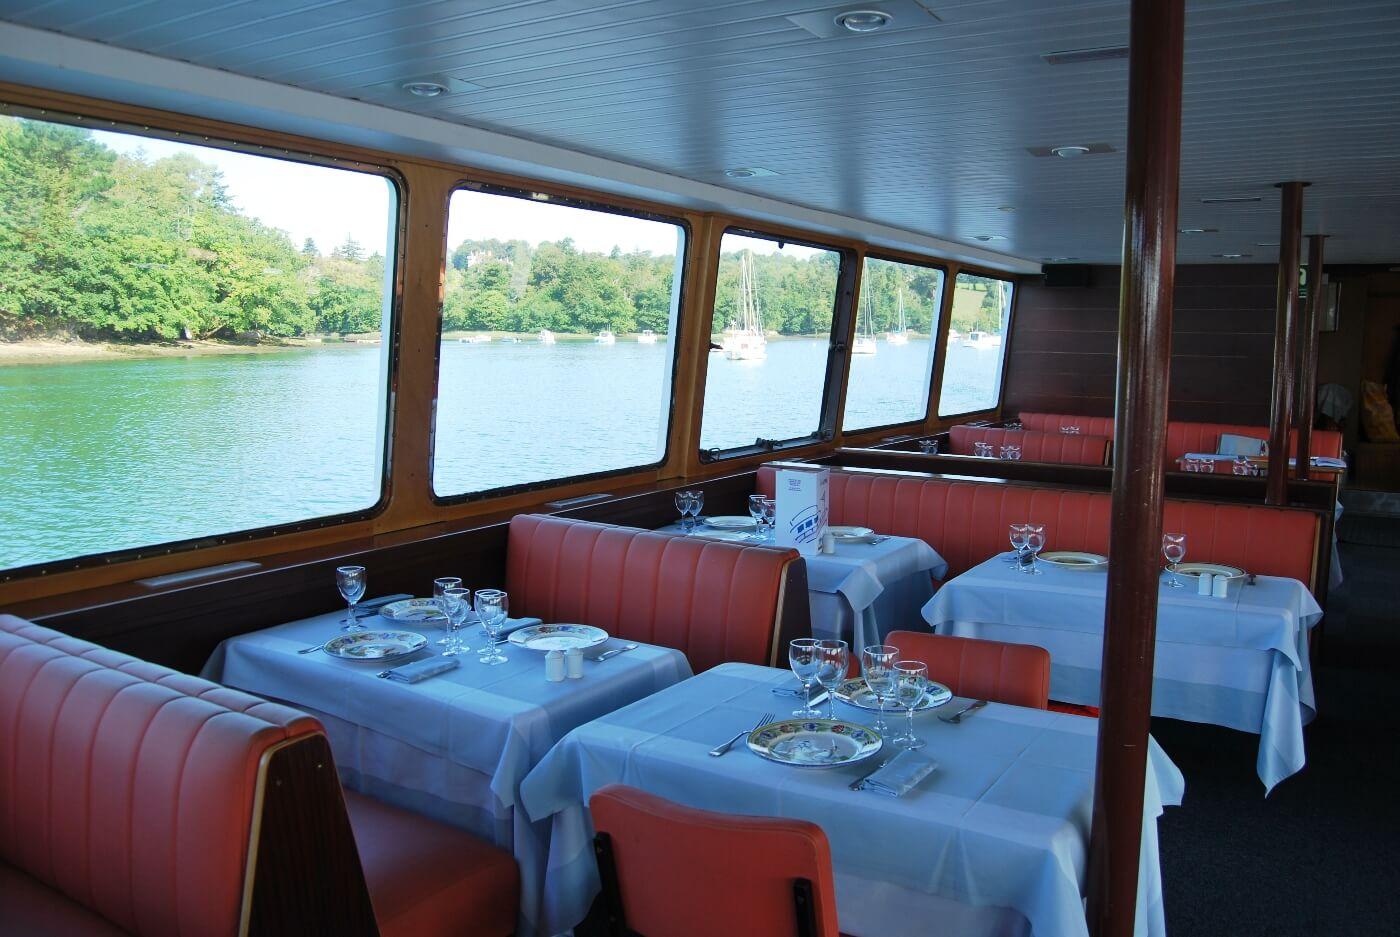 salle bateau restaurant aigrette benodet riviere odet